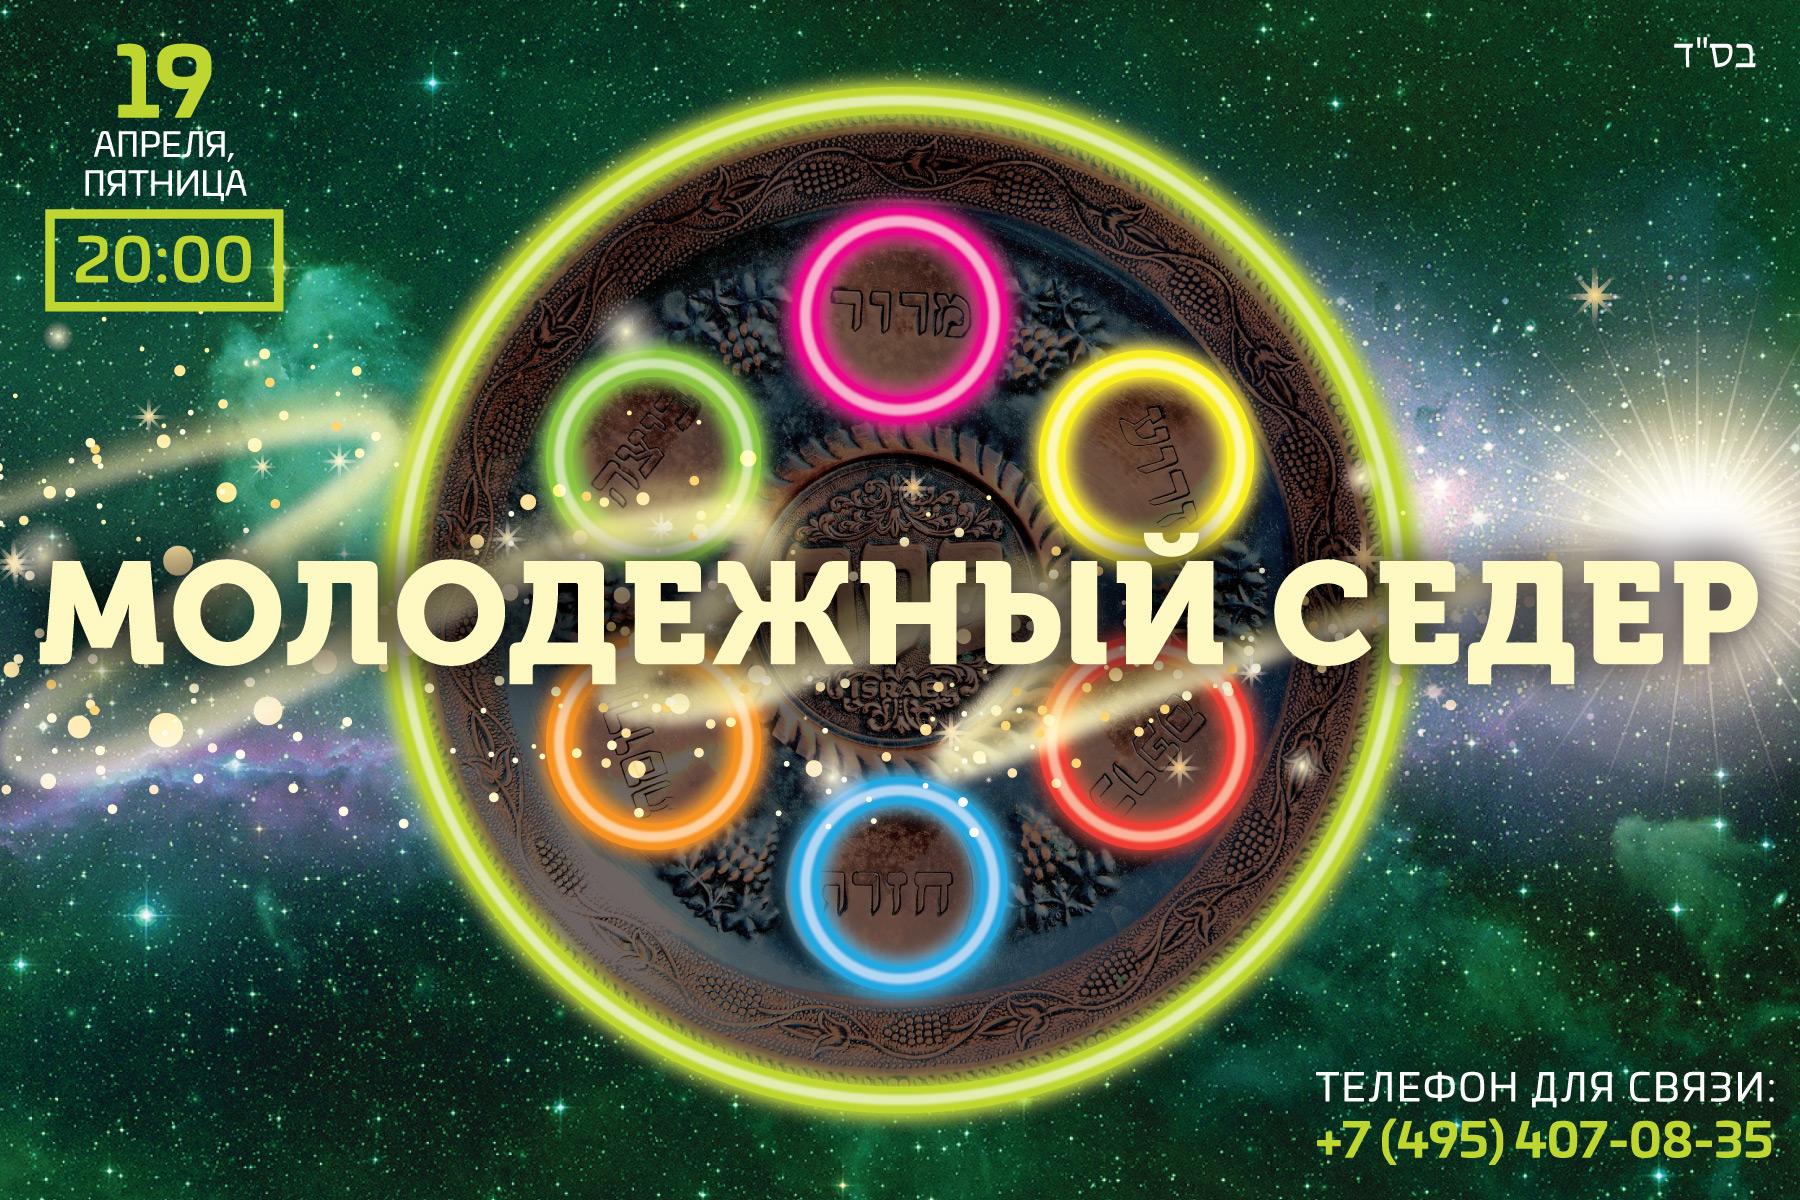 Zhuk_Pesah2019_YouthSeder_Website_Announcement